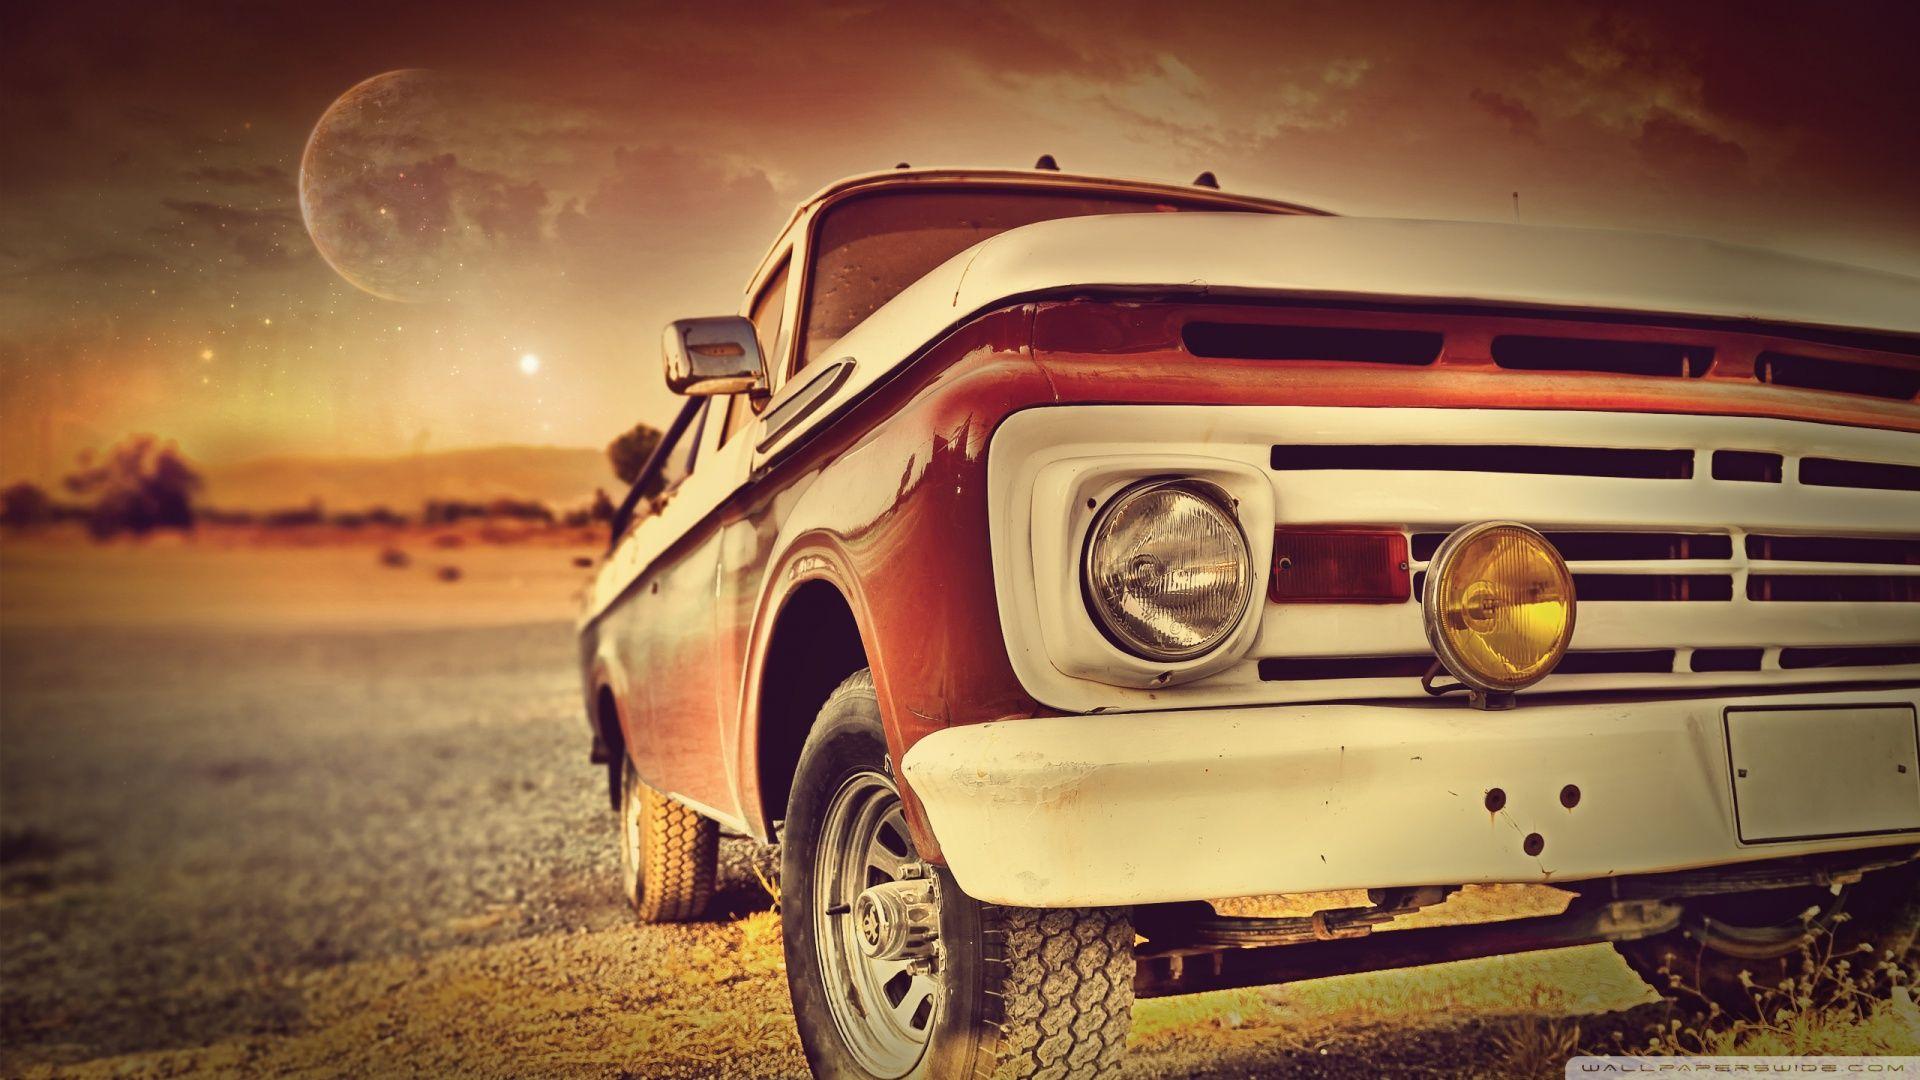 25 Free Vintage Photography Desktop Wallpapers Fondos De